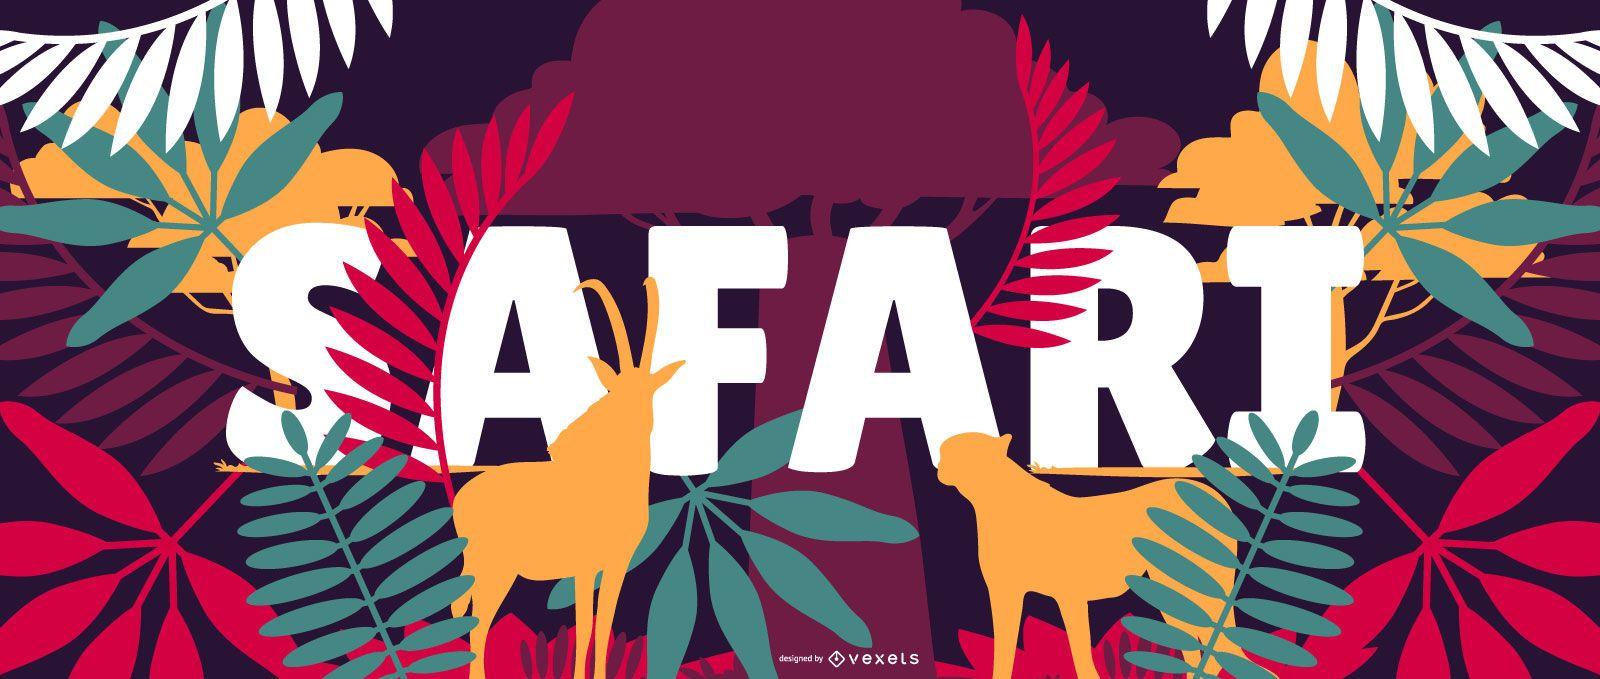 Safari Nature Banner Design